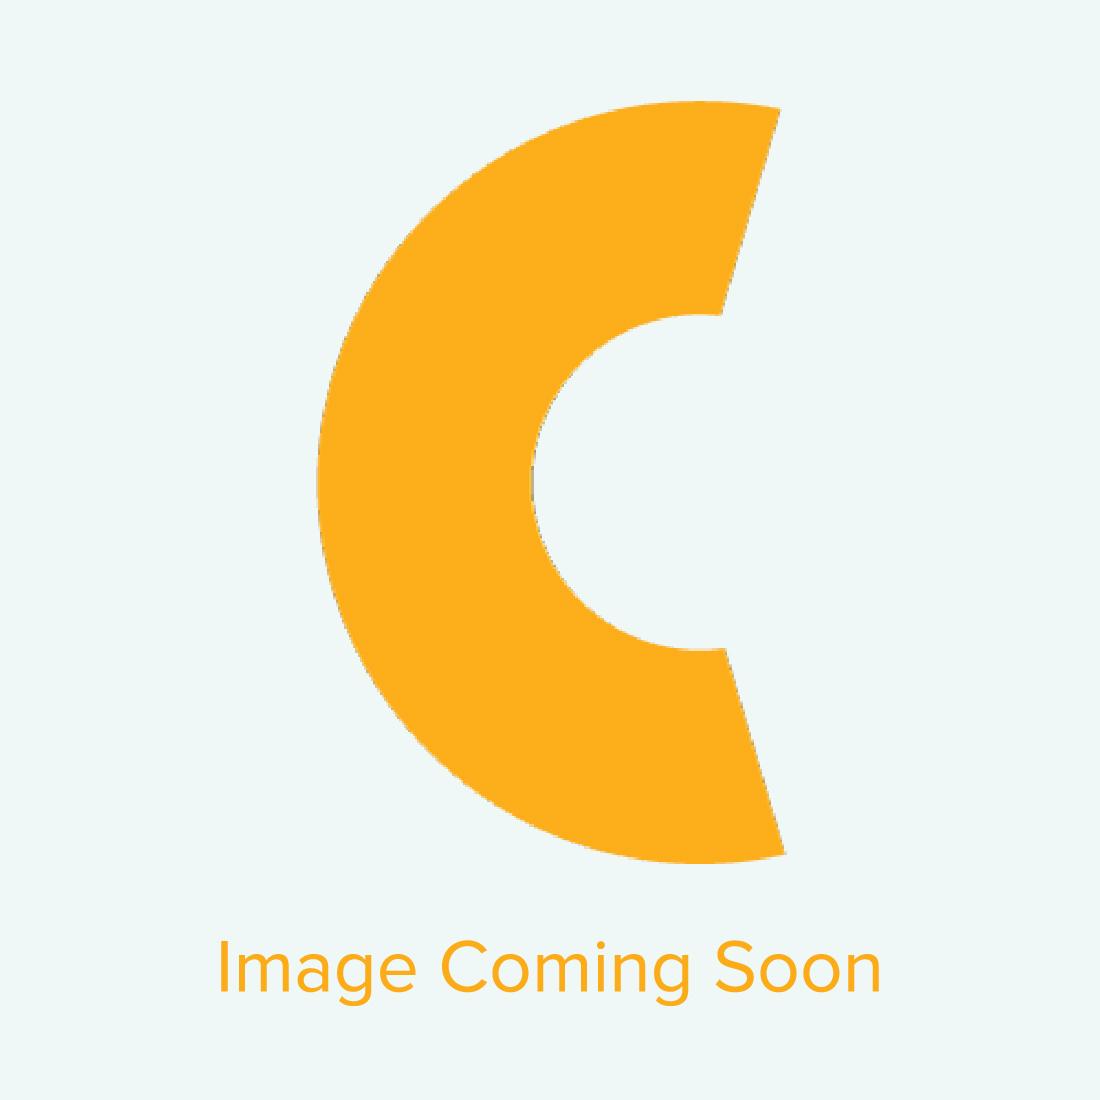 "ReproJet P - Premium Silk Screen Film Roll - 0.125mm - 44"" x 100 feet"